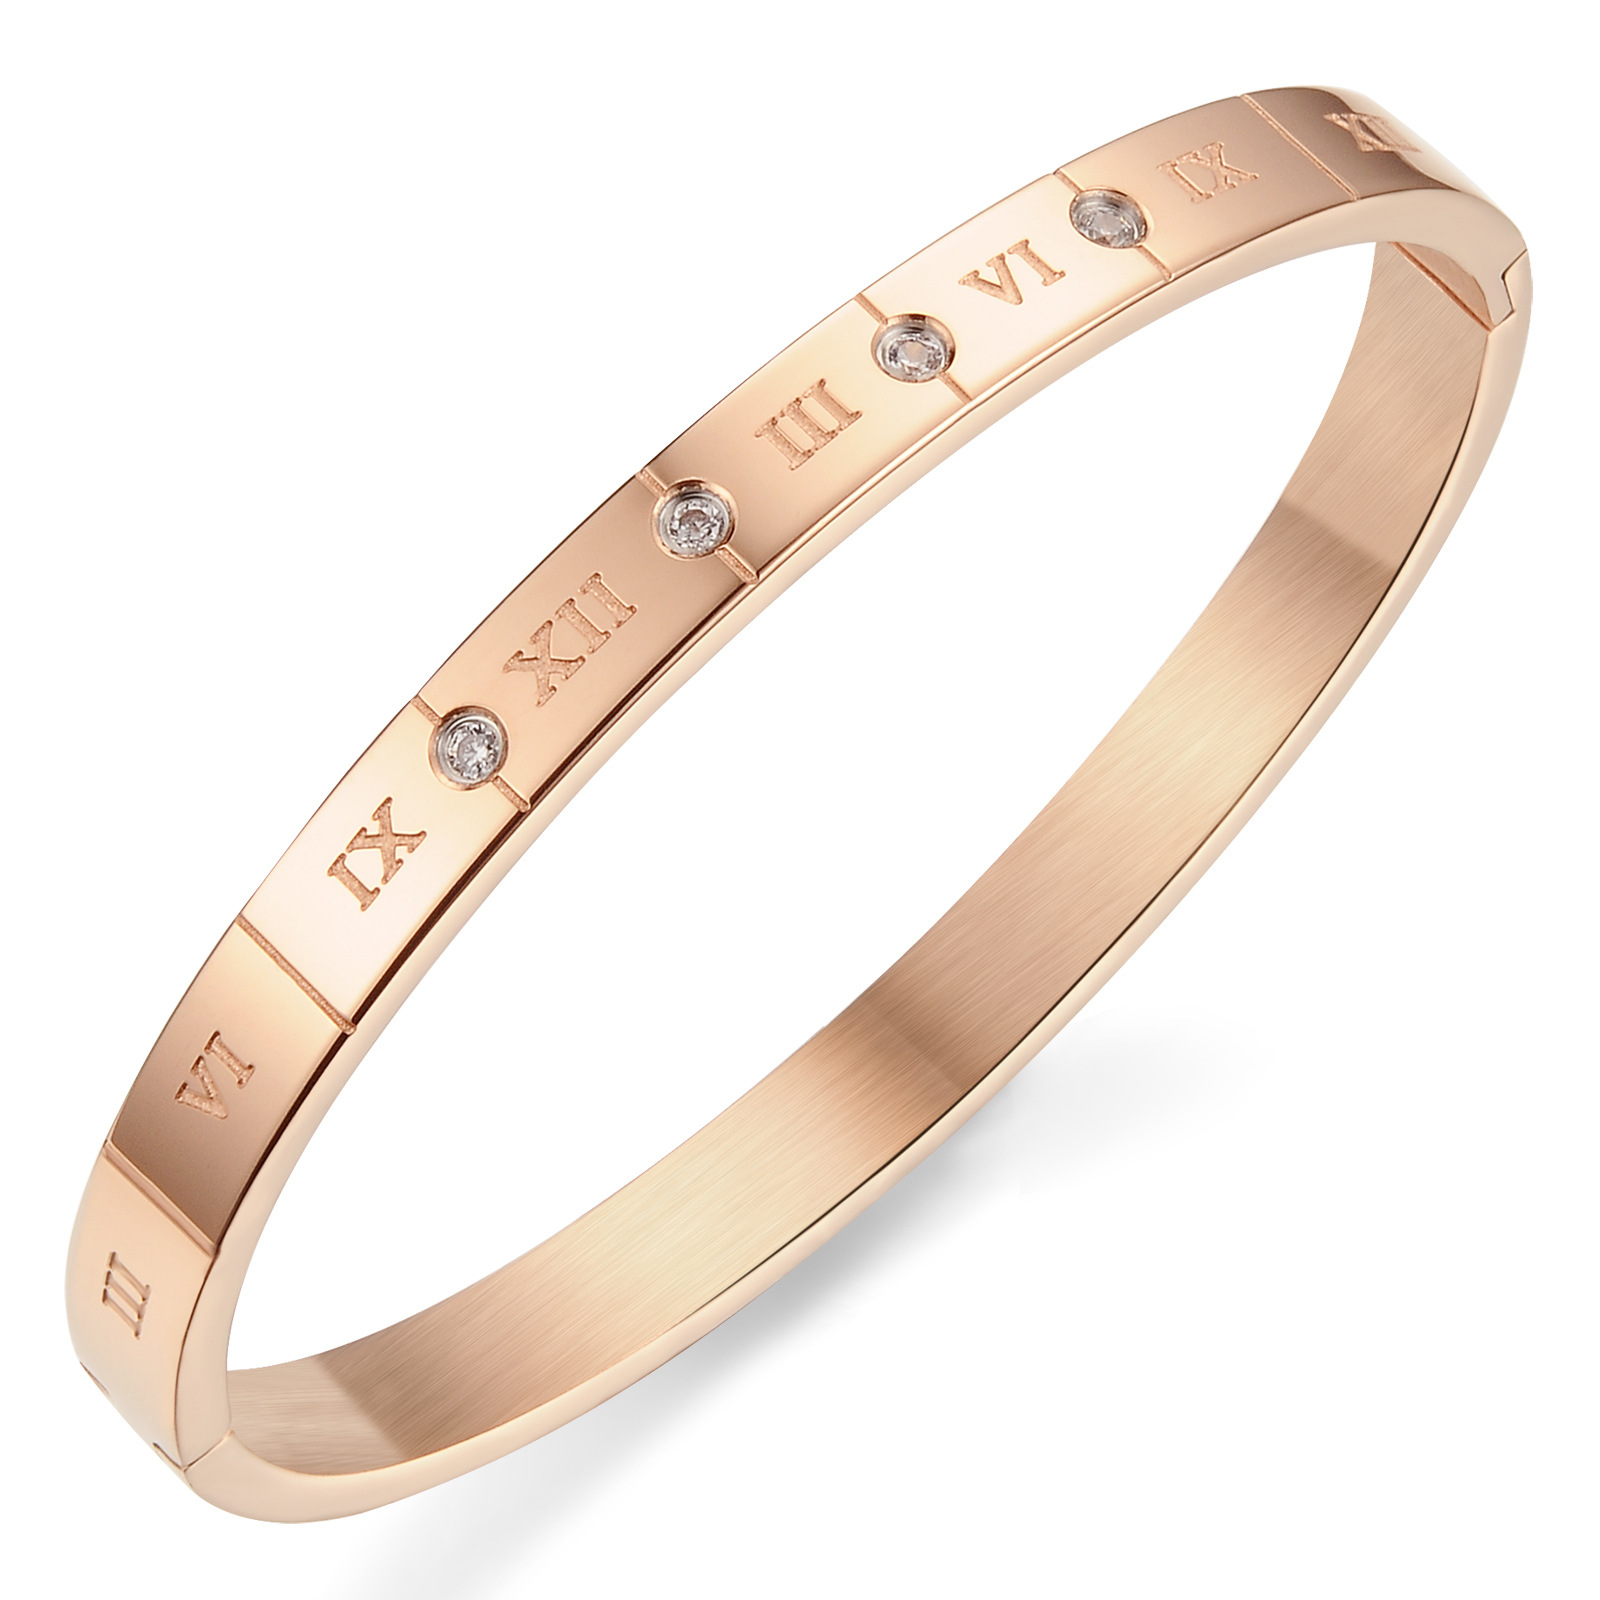 Bulgaria Jewelry Stainless Steel Bracelet Roman Numerals